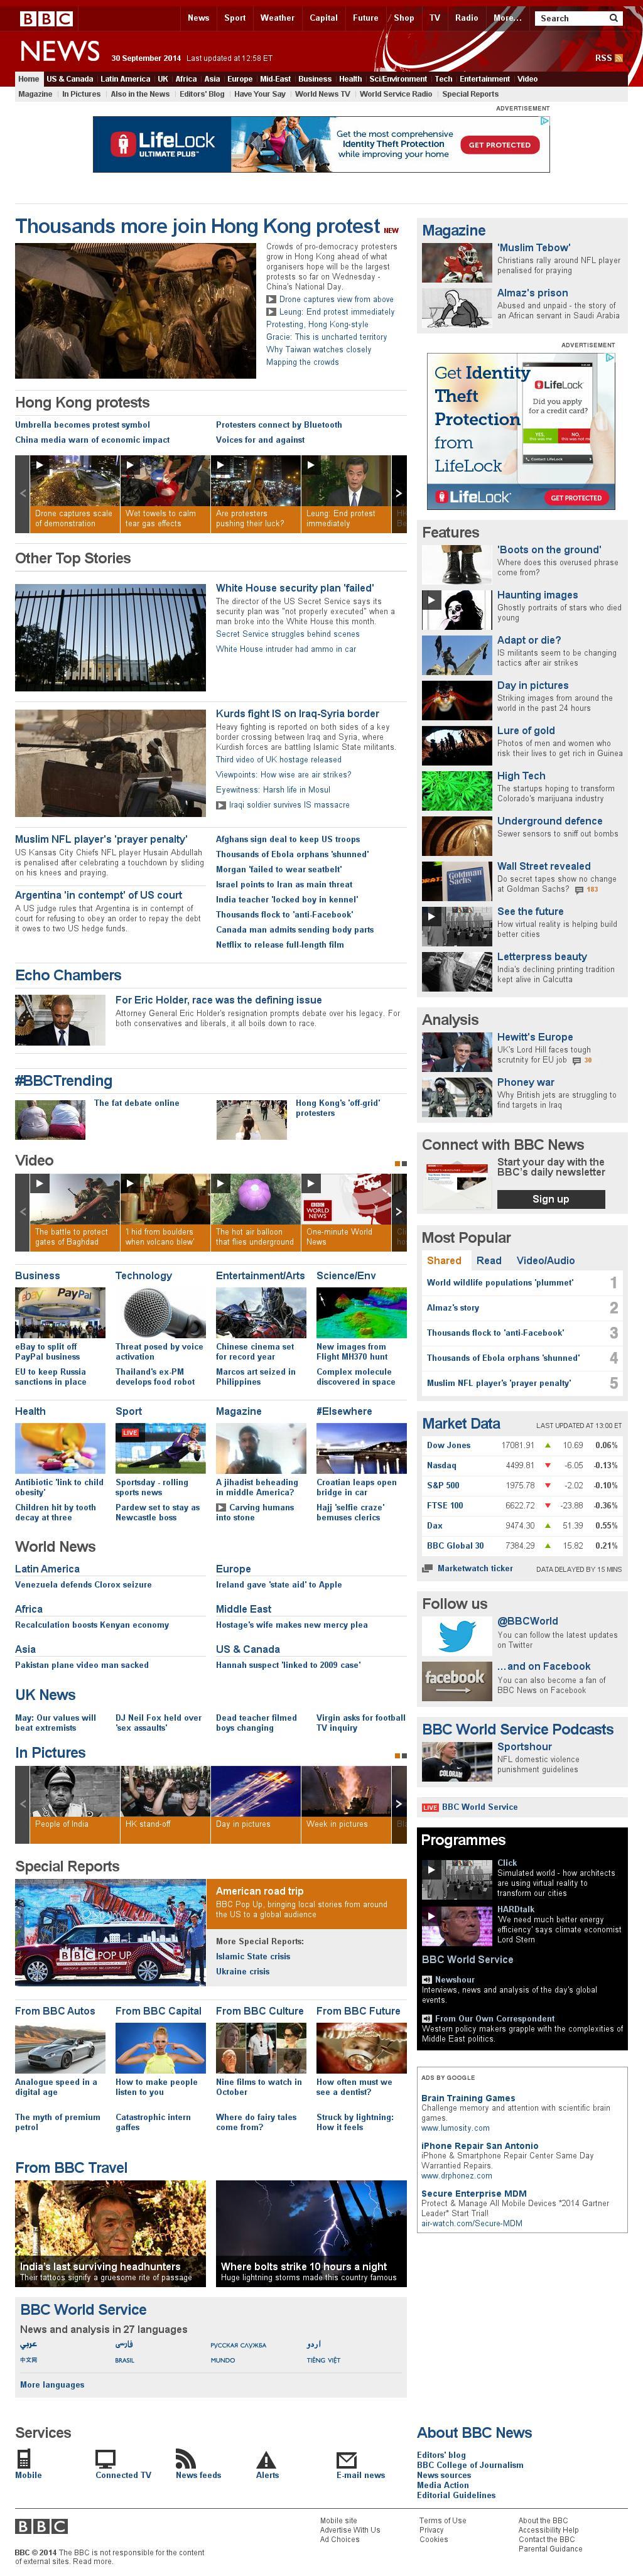 BBC at Tuesday Sept. 30, 2014, 5:01 p.m. UTC